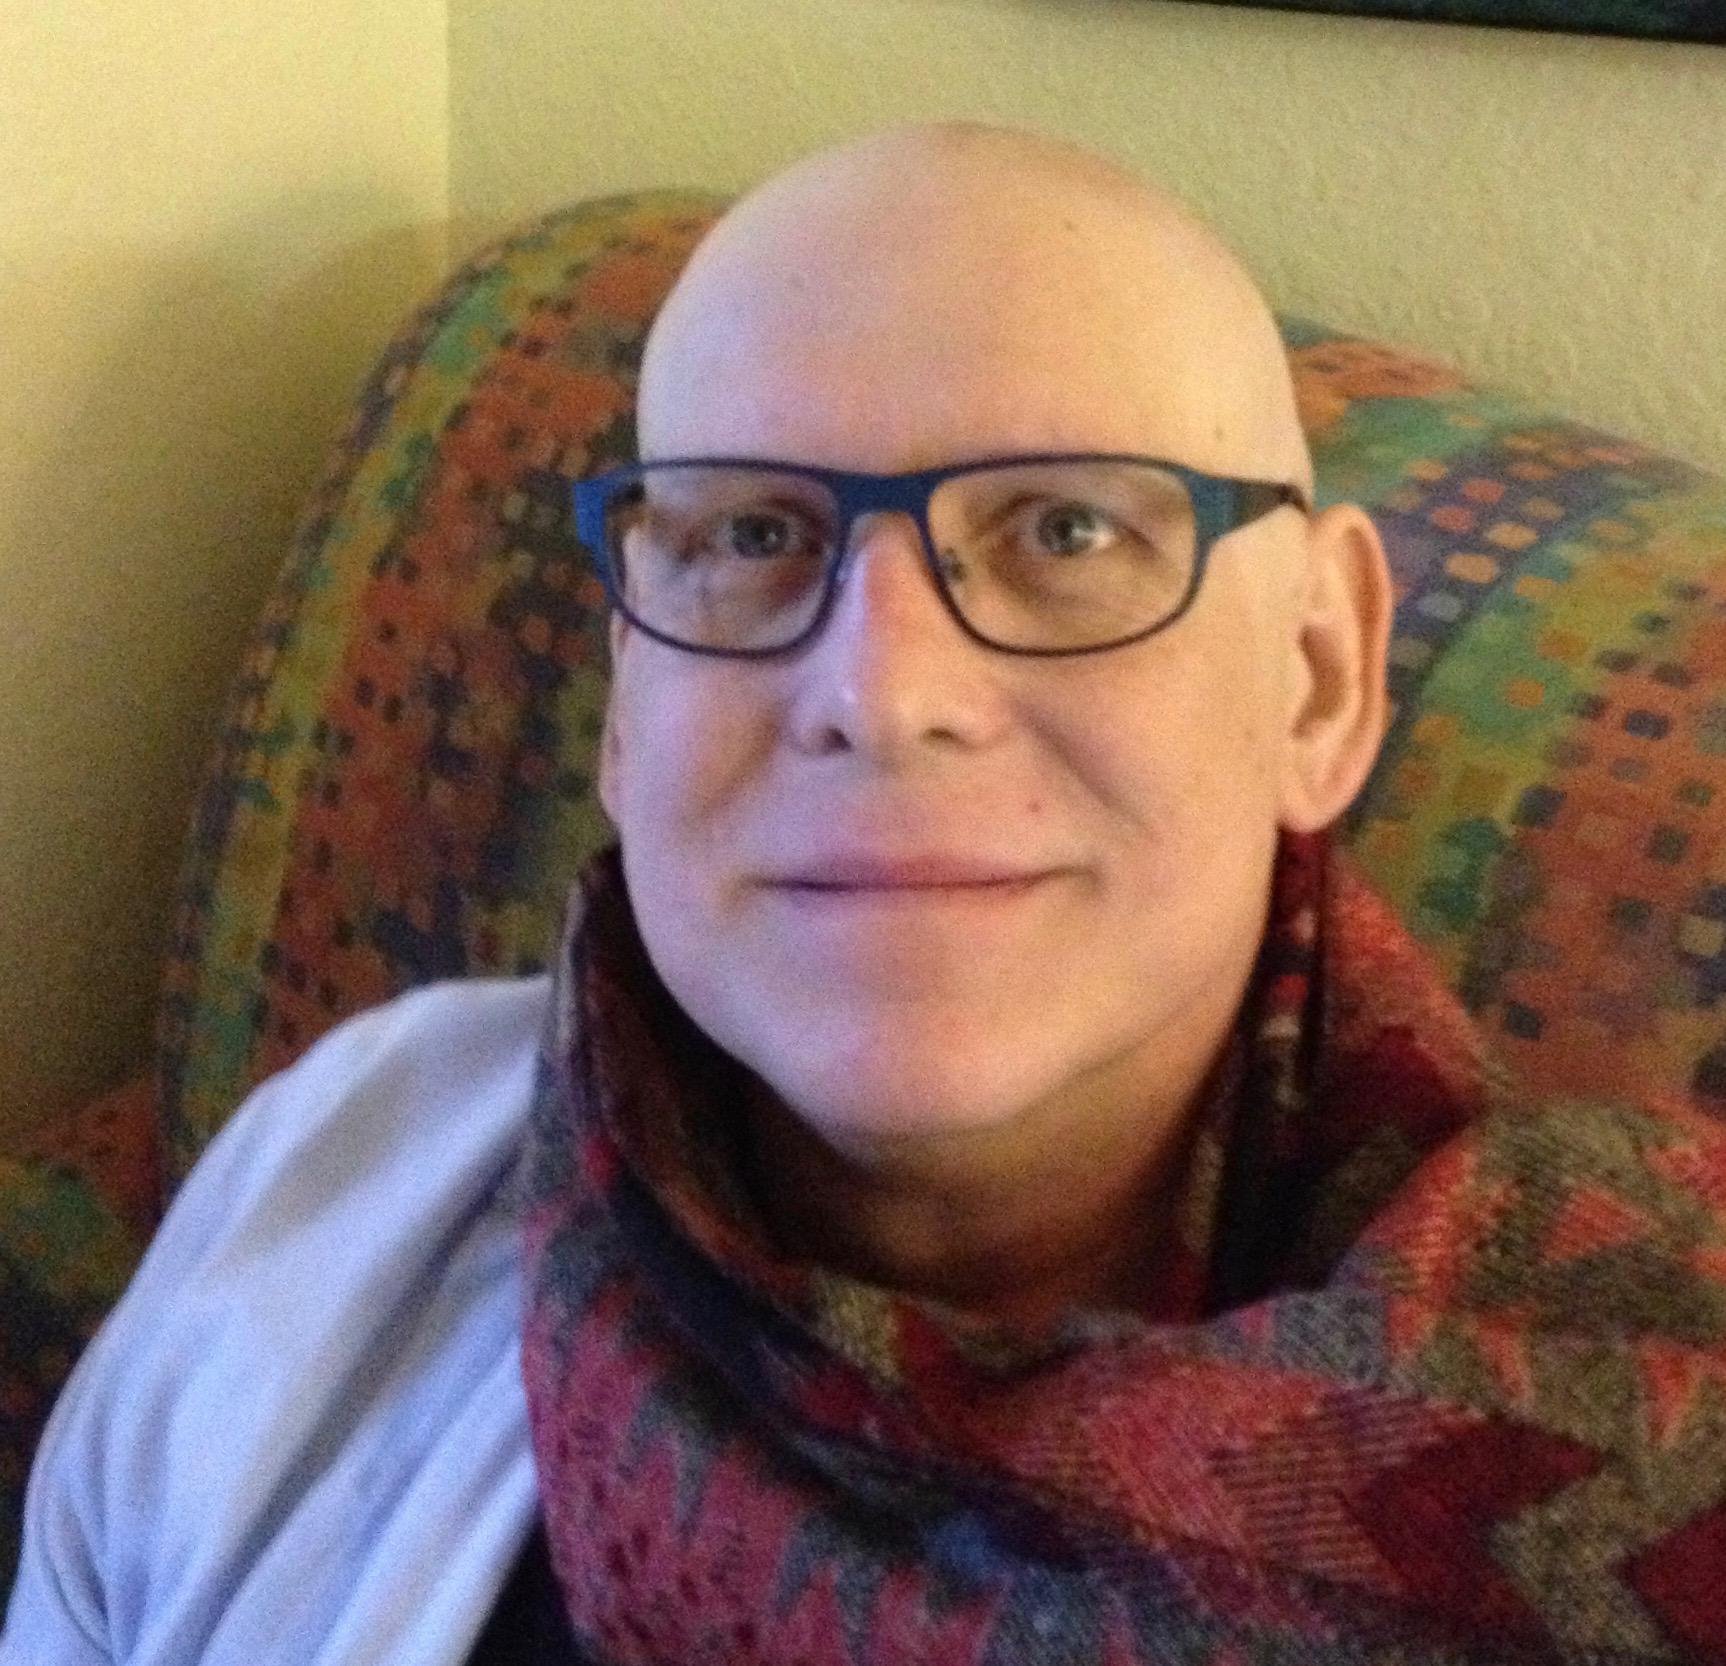 George scarf chemo no hair 2.3.13-cropped.jpg